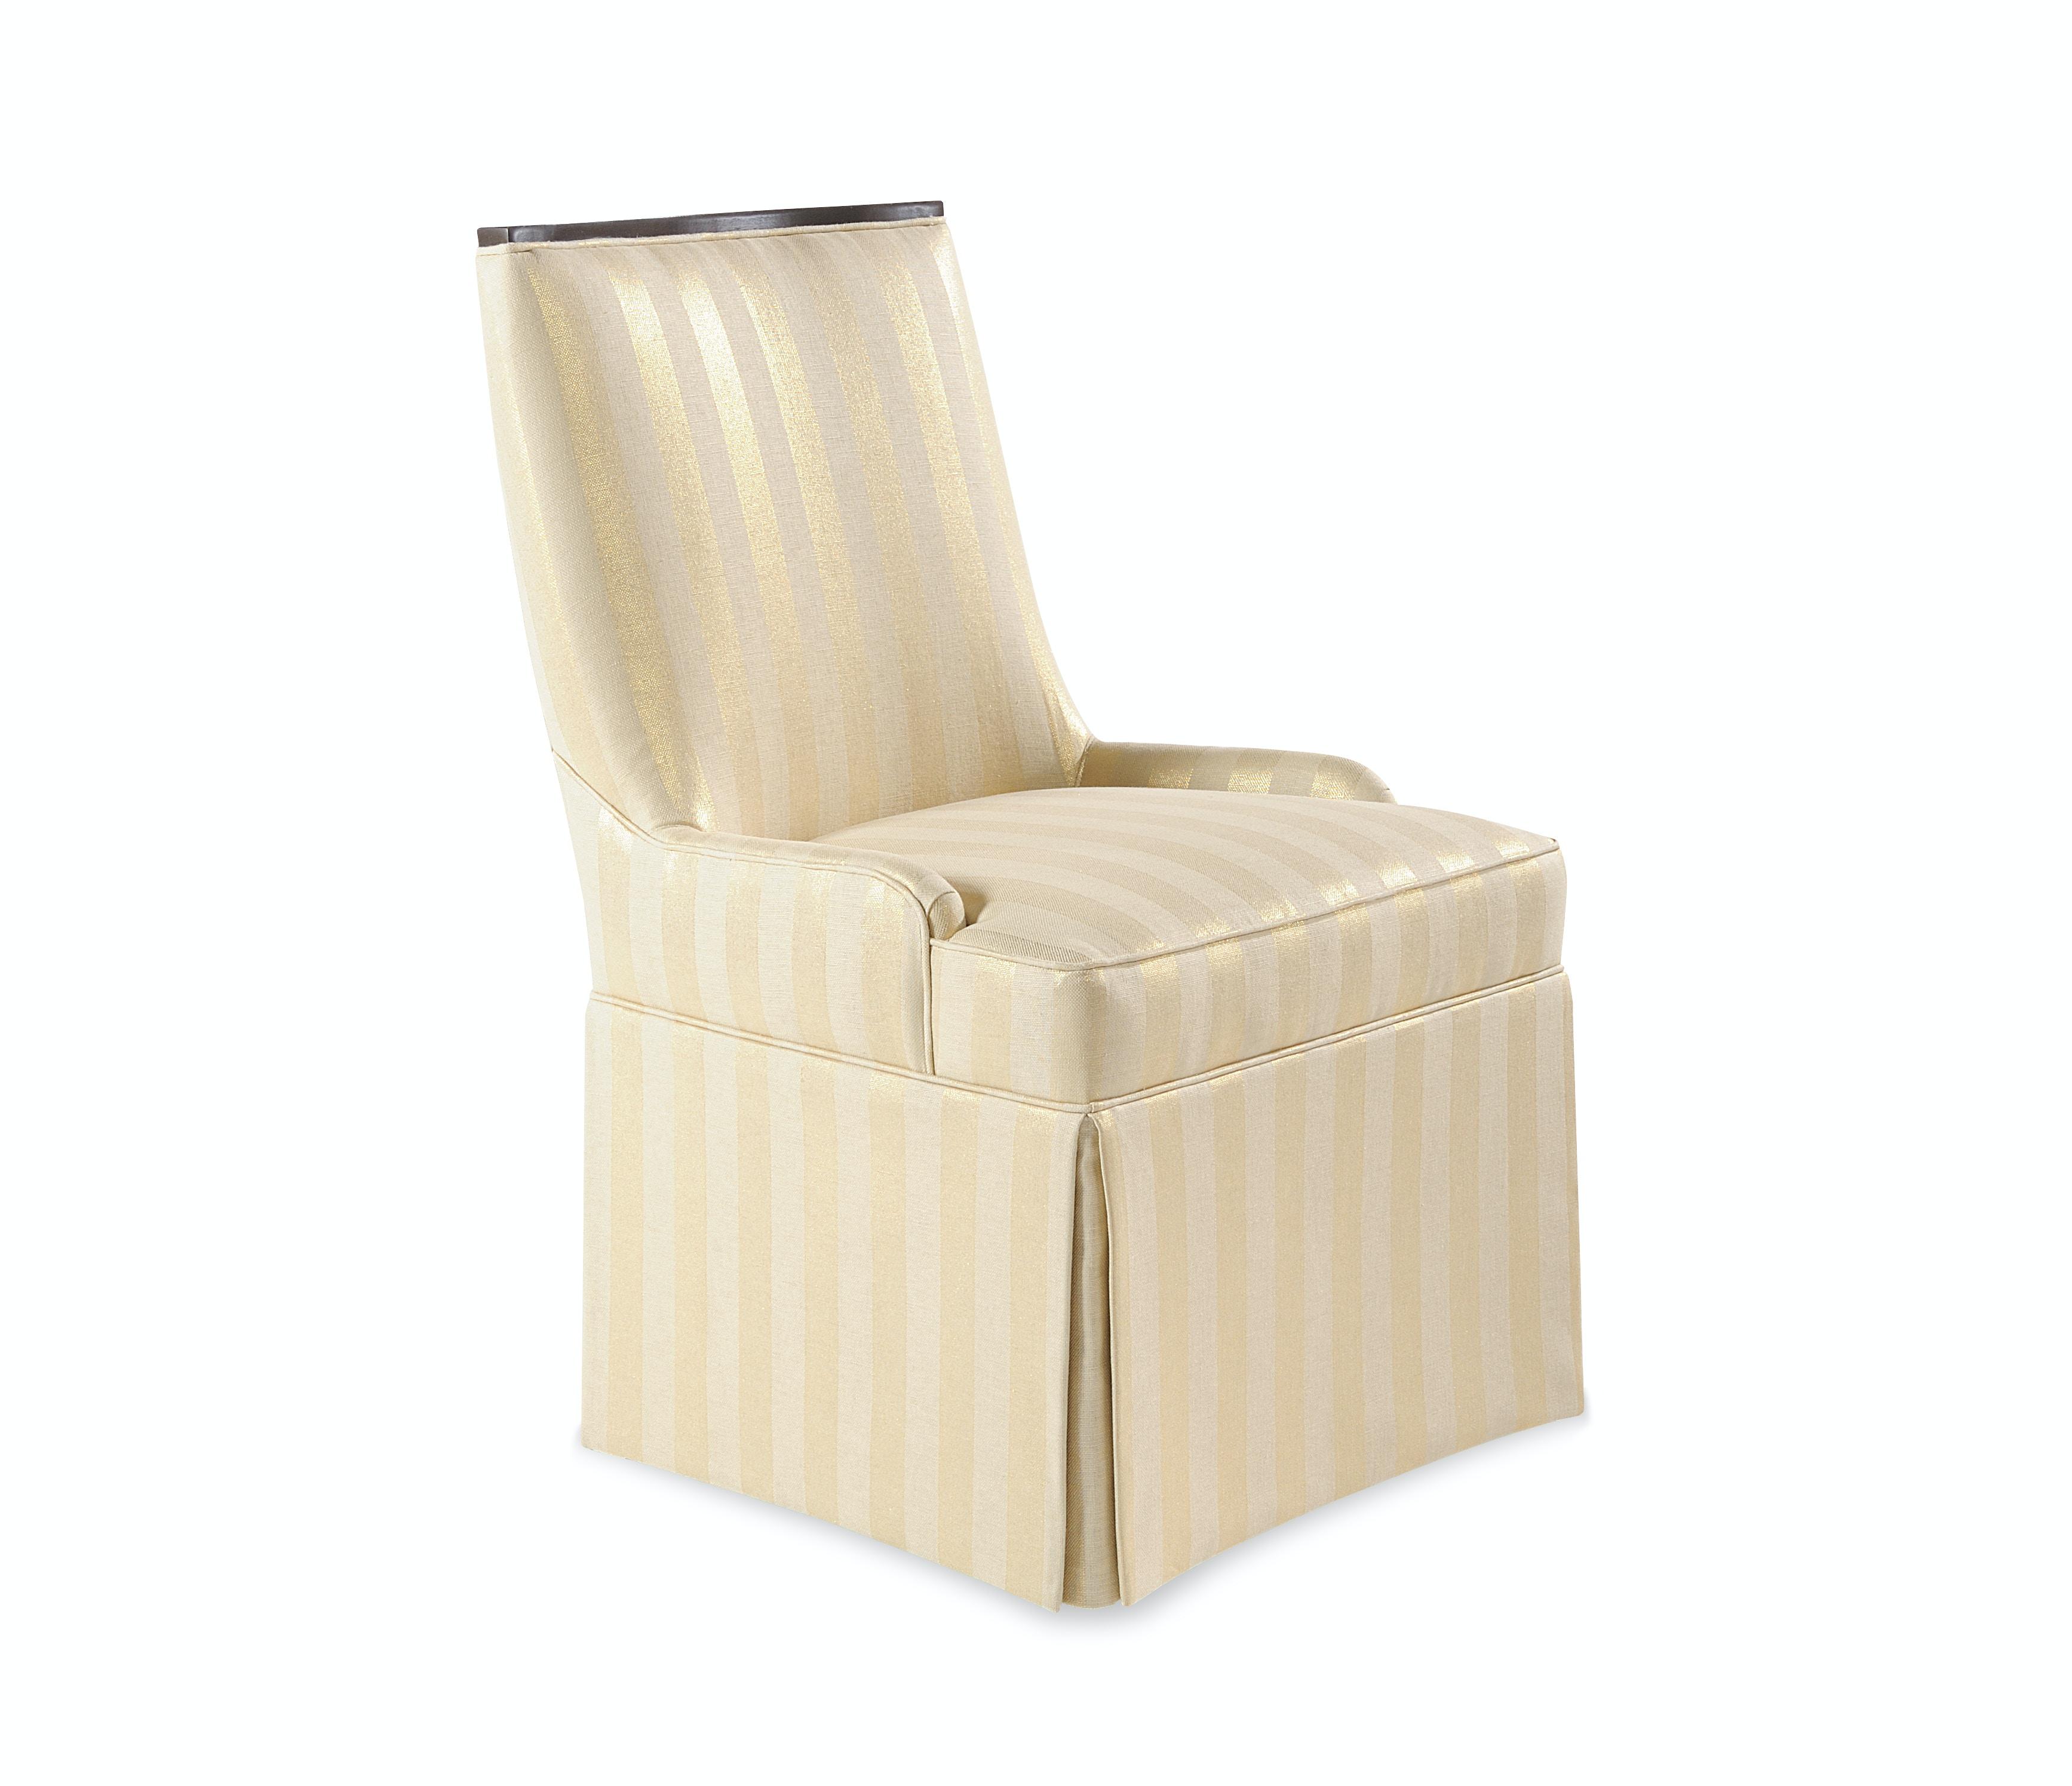 Taylor King Furniture Joy Chair 8816 01